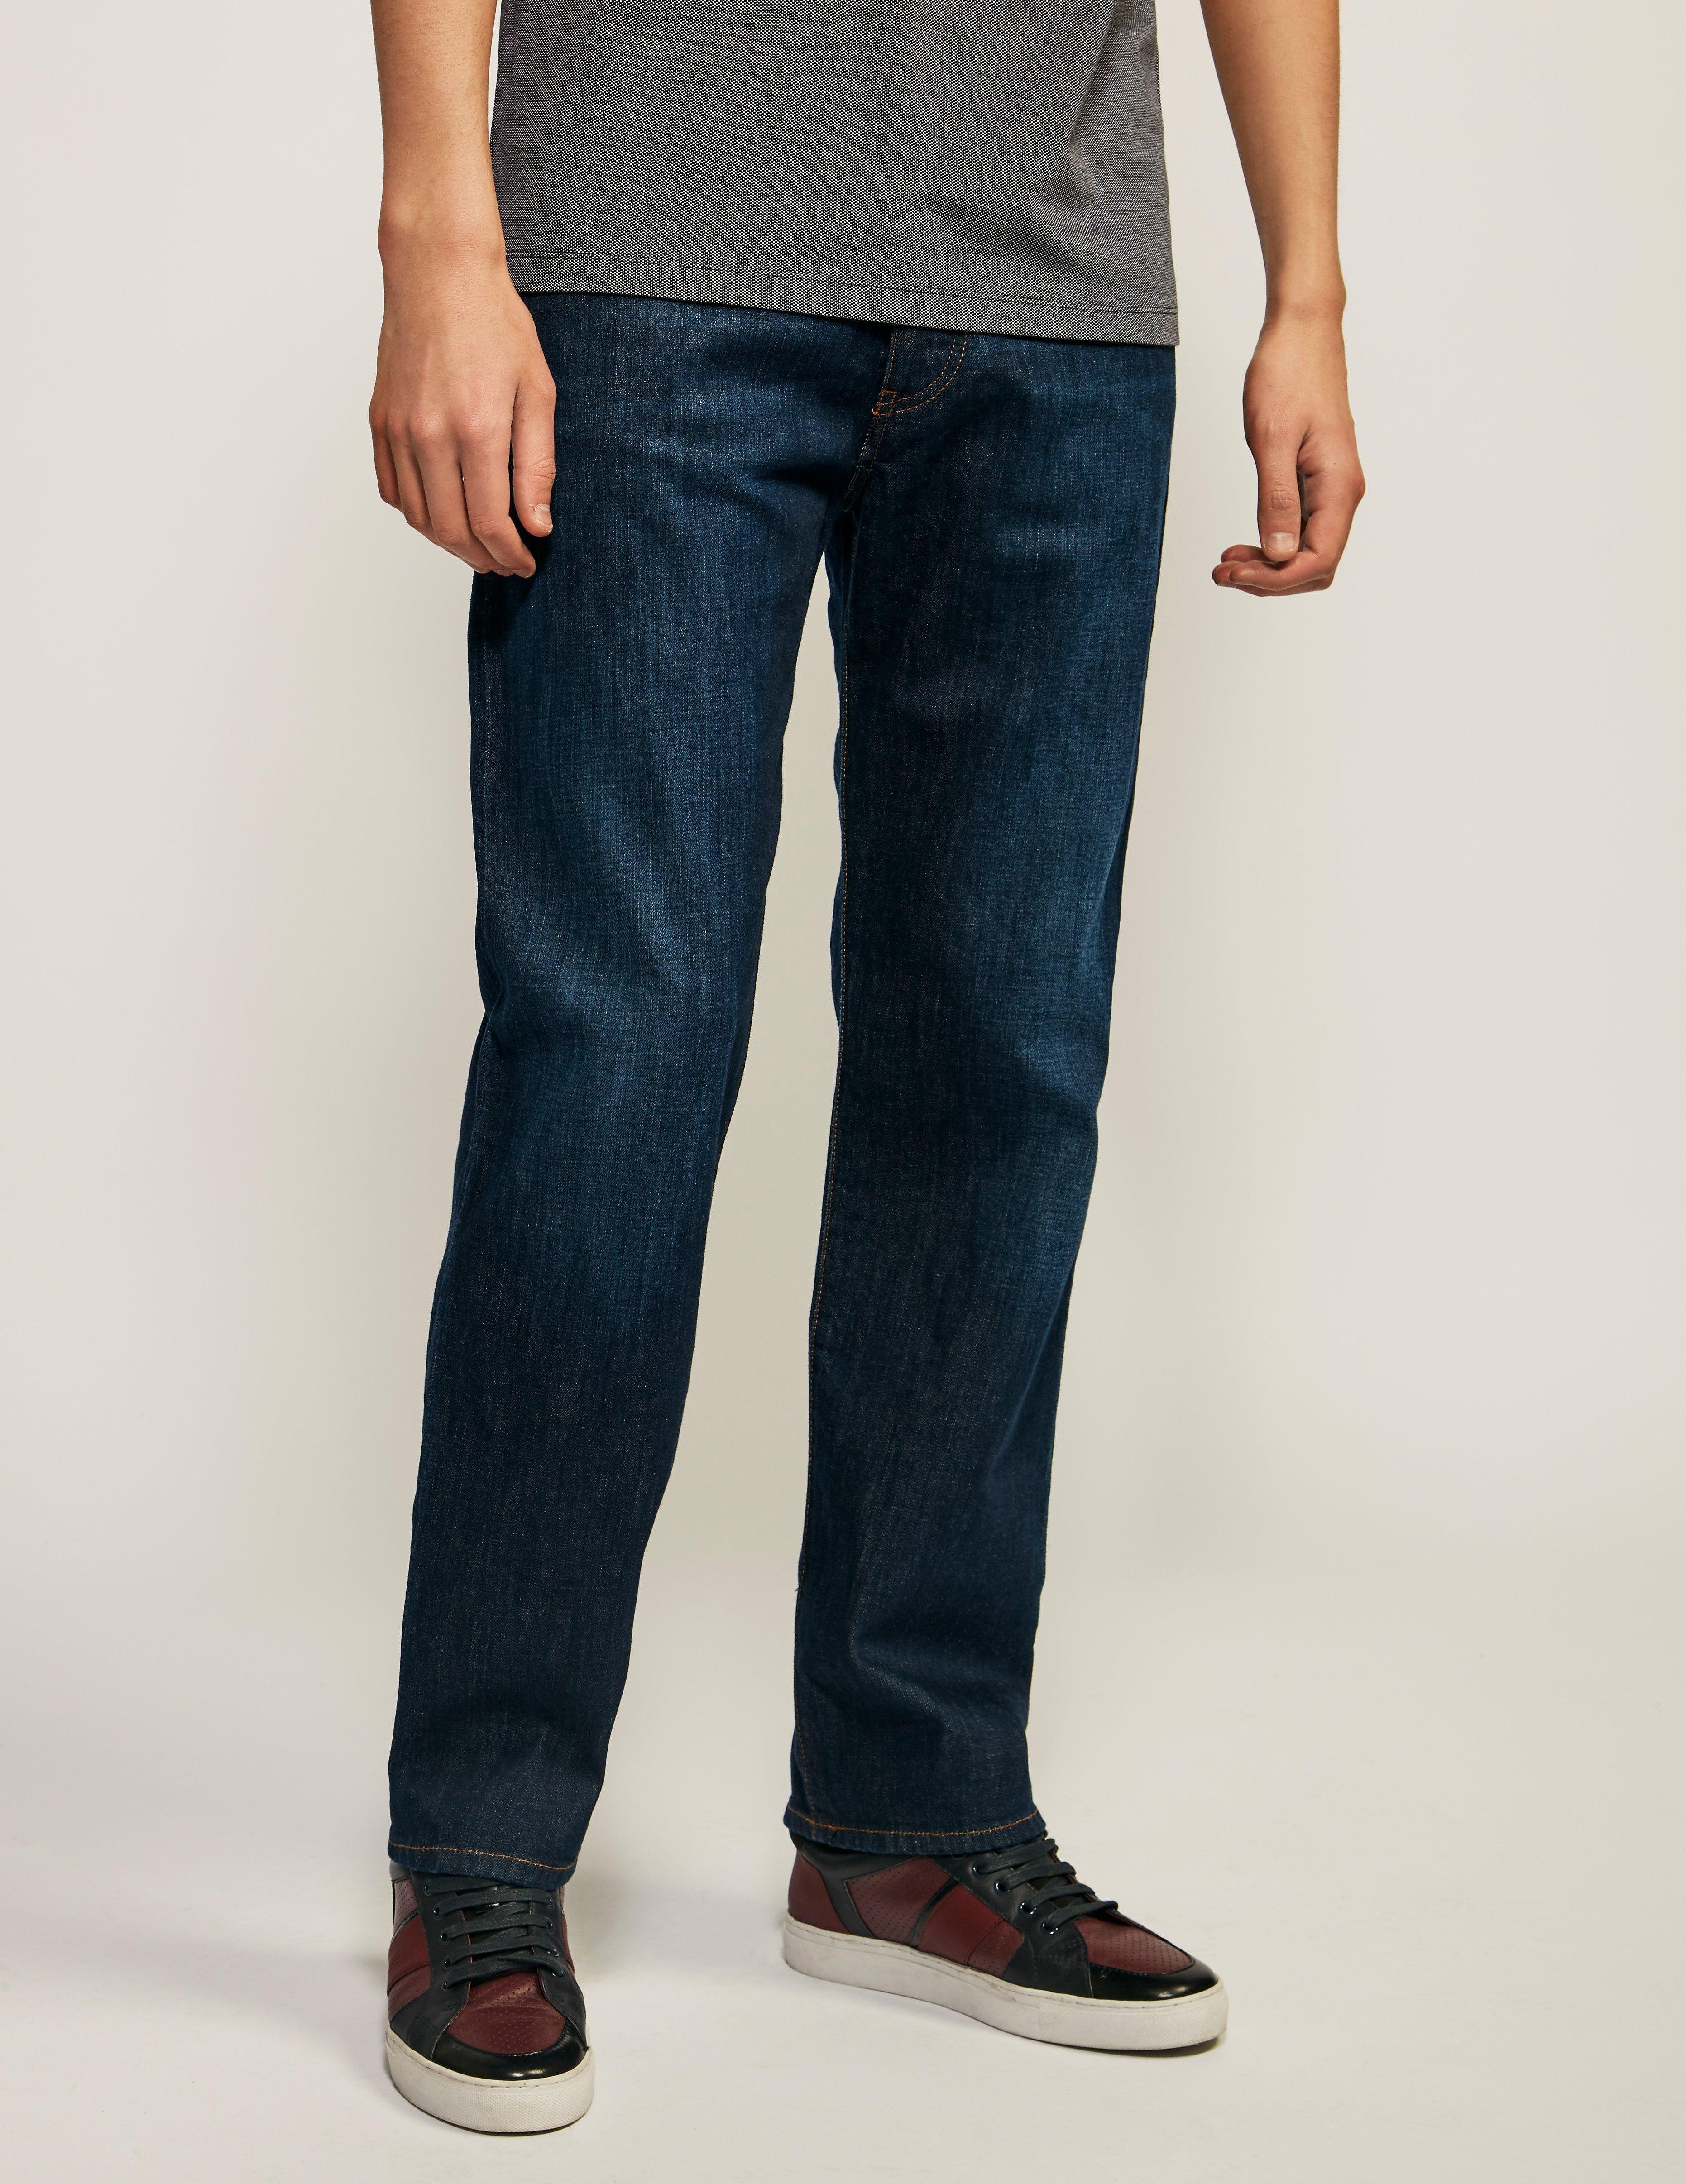 Armani Jeans J21 Regular Fit Jeans - Short Leg